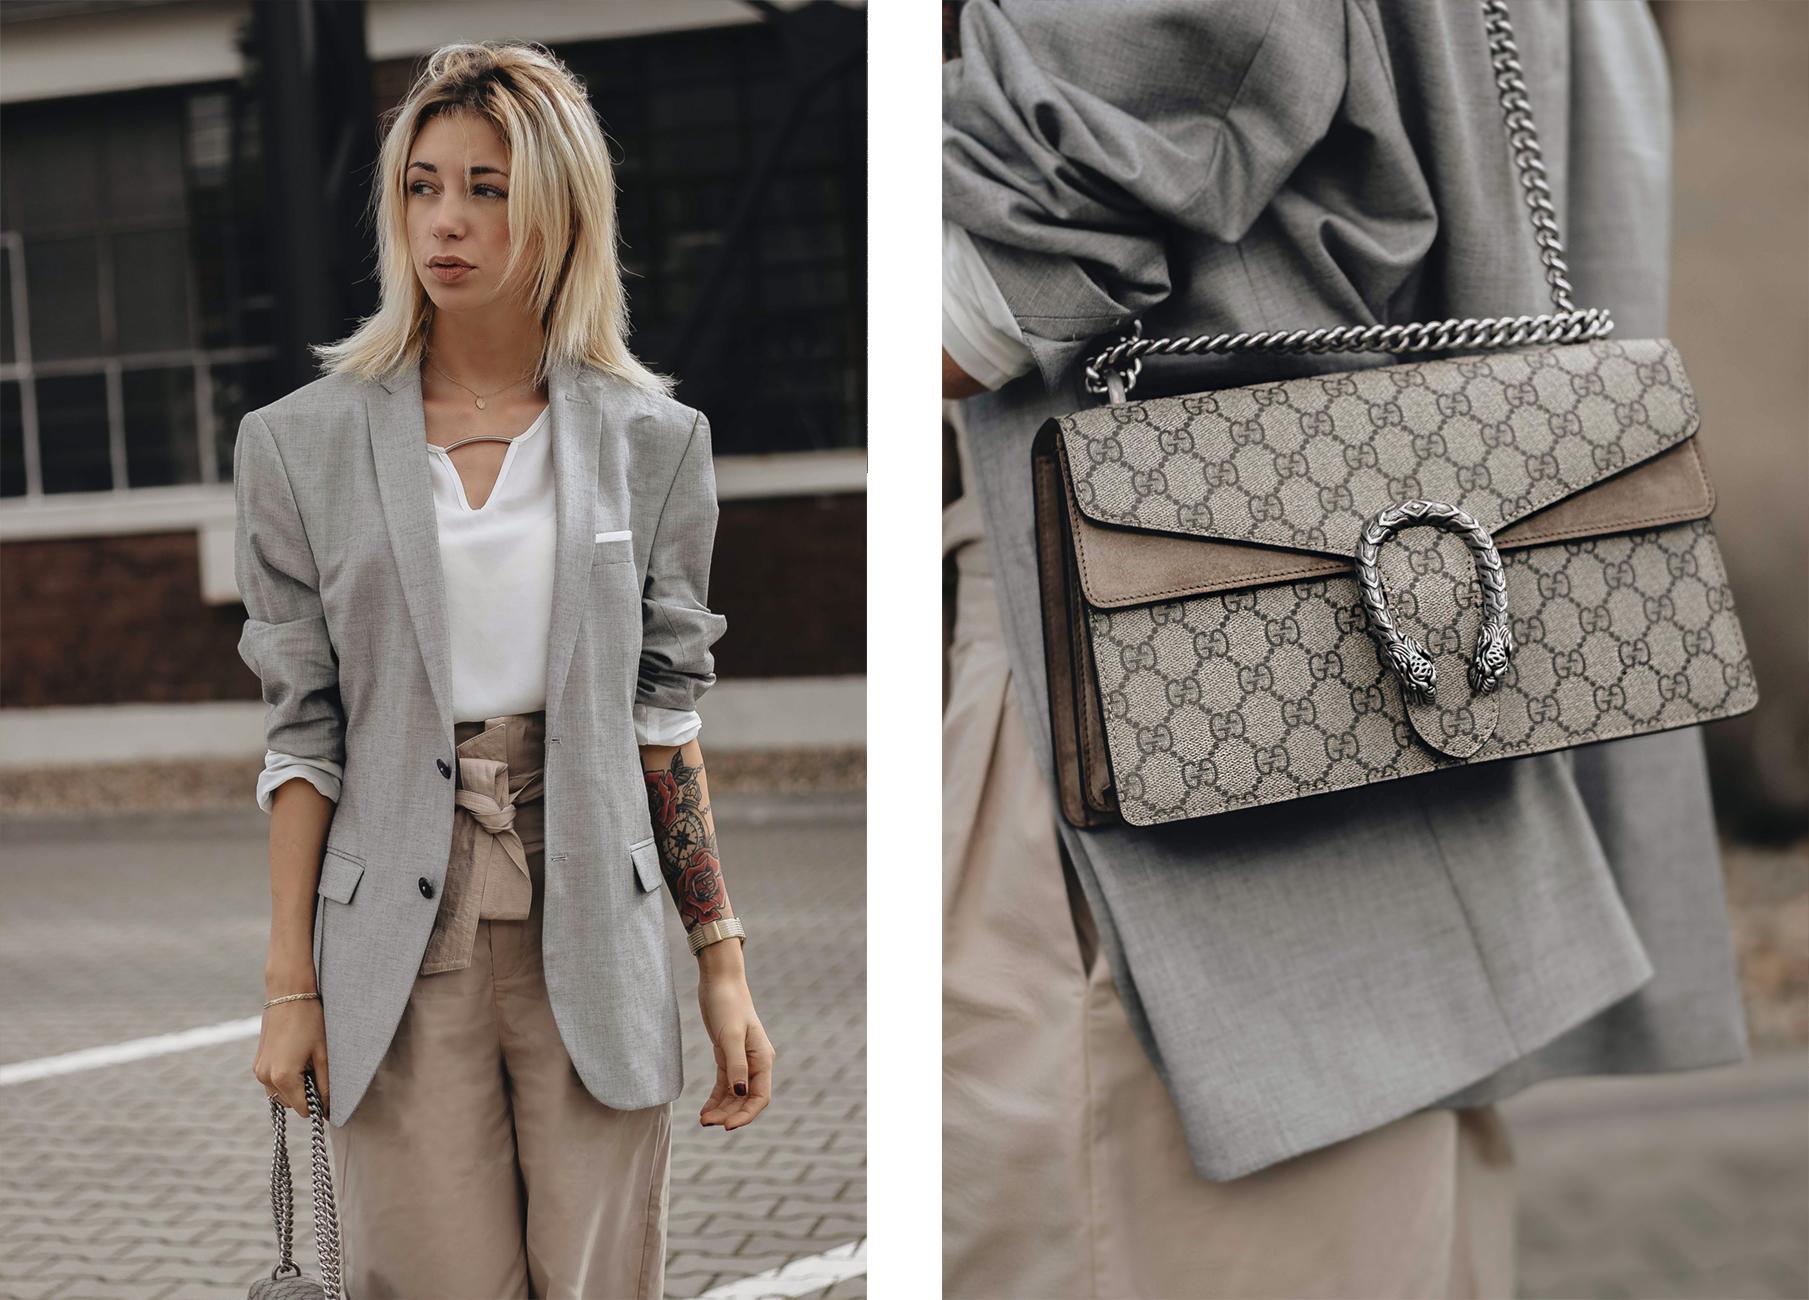 business-influencer-blogger-fashionblog-modeblog-koeln-instagram-style